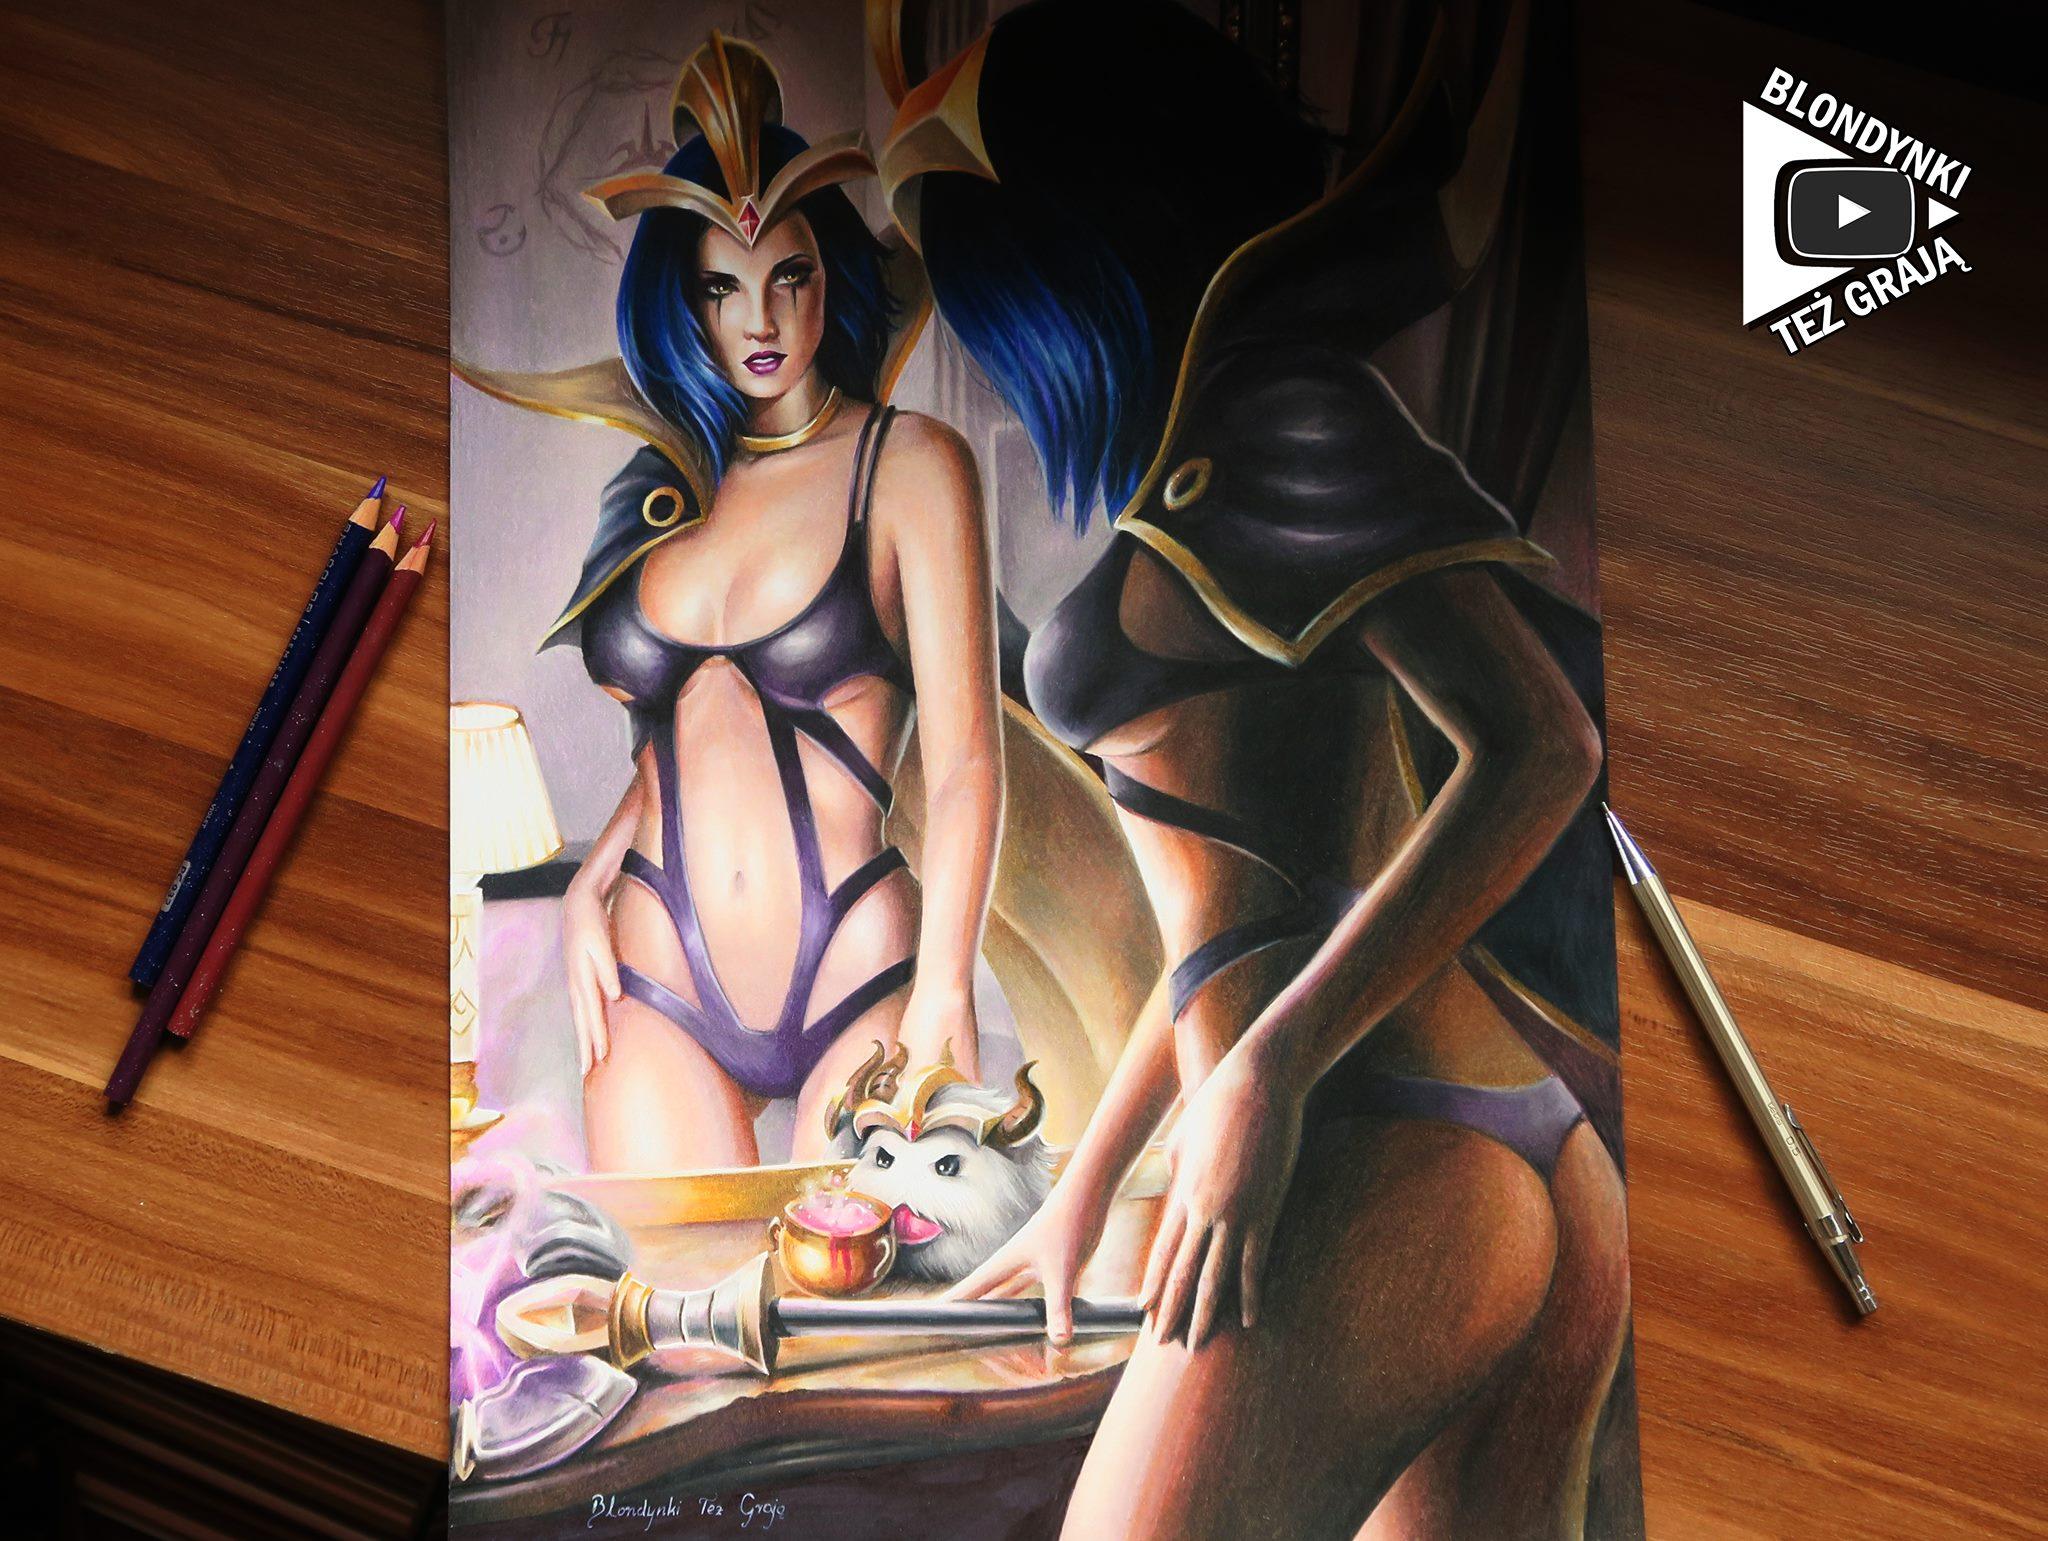 Le Blanc drawing by Blondynki Też Grają - League of Legends art